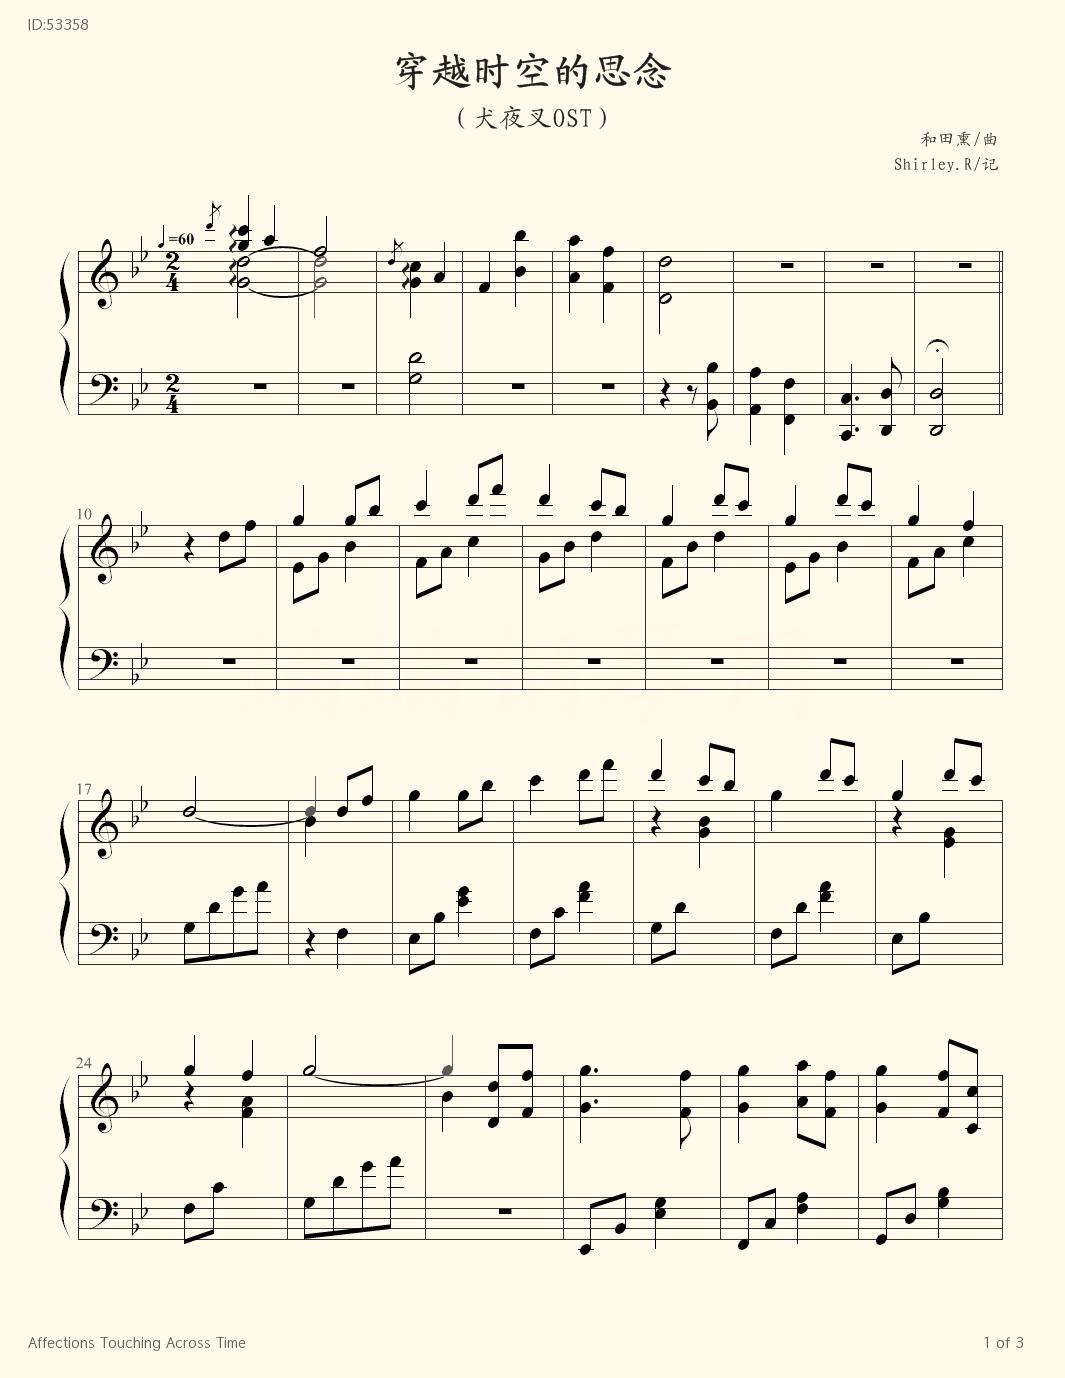 Affections touching across time piano sheet music